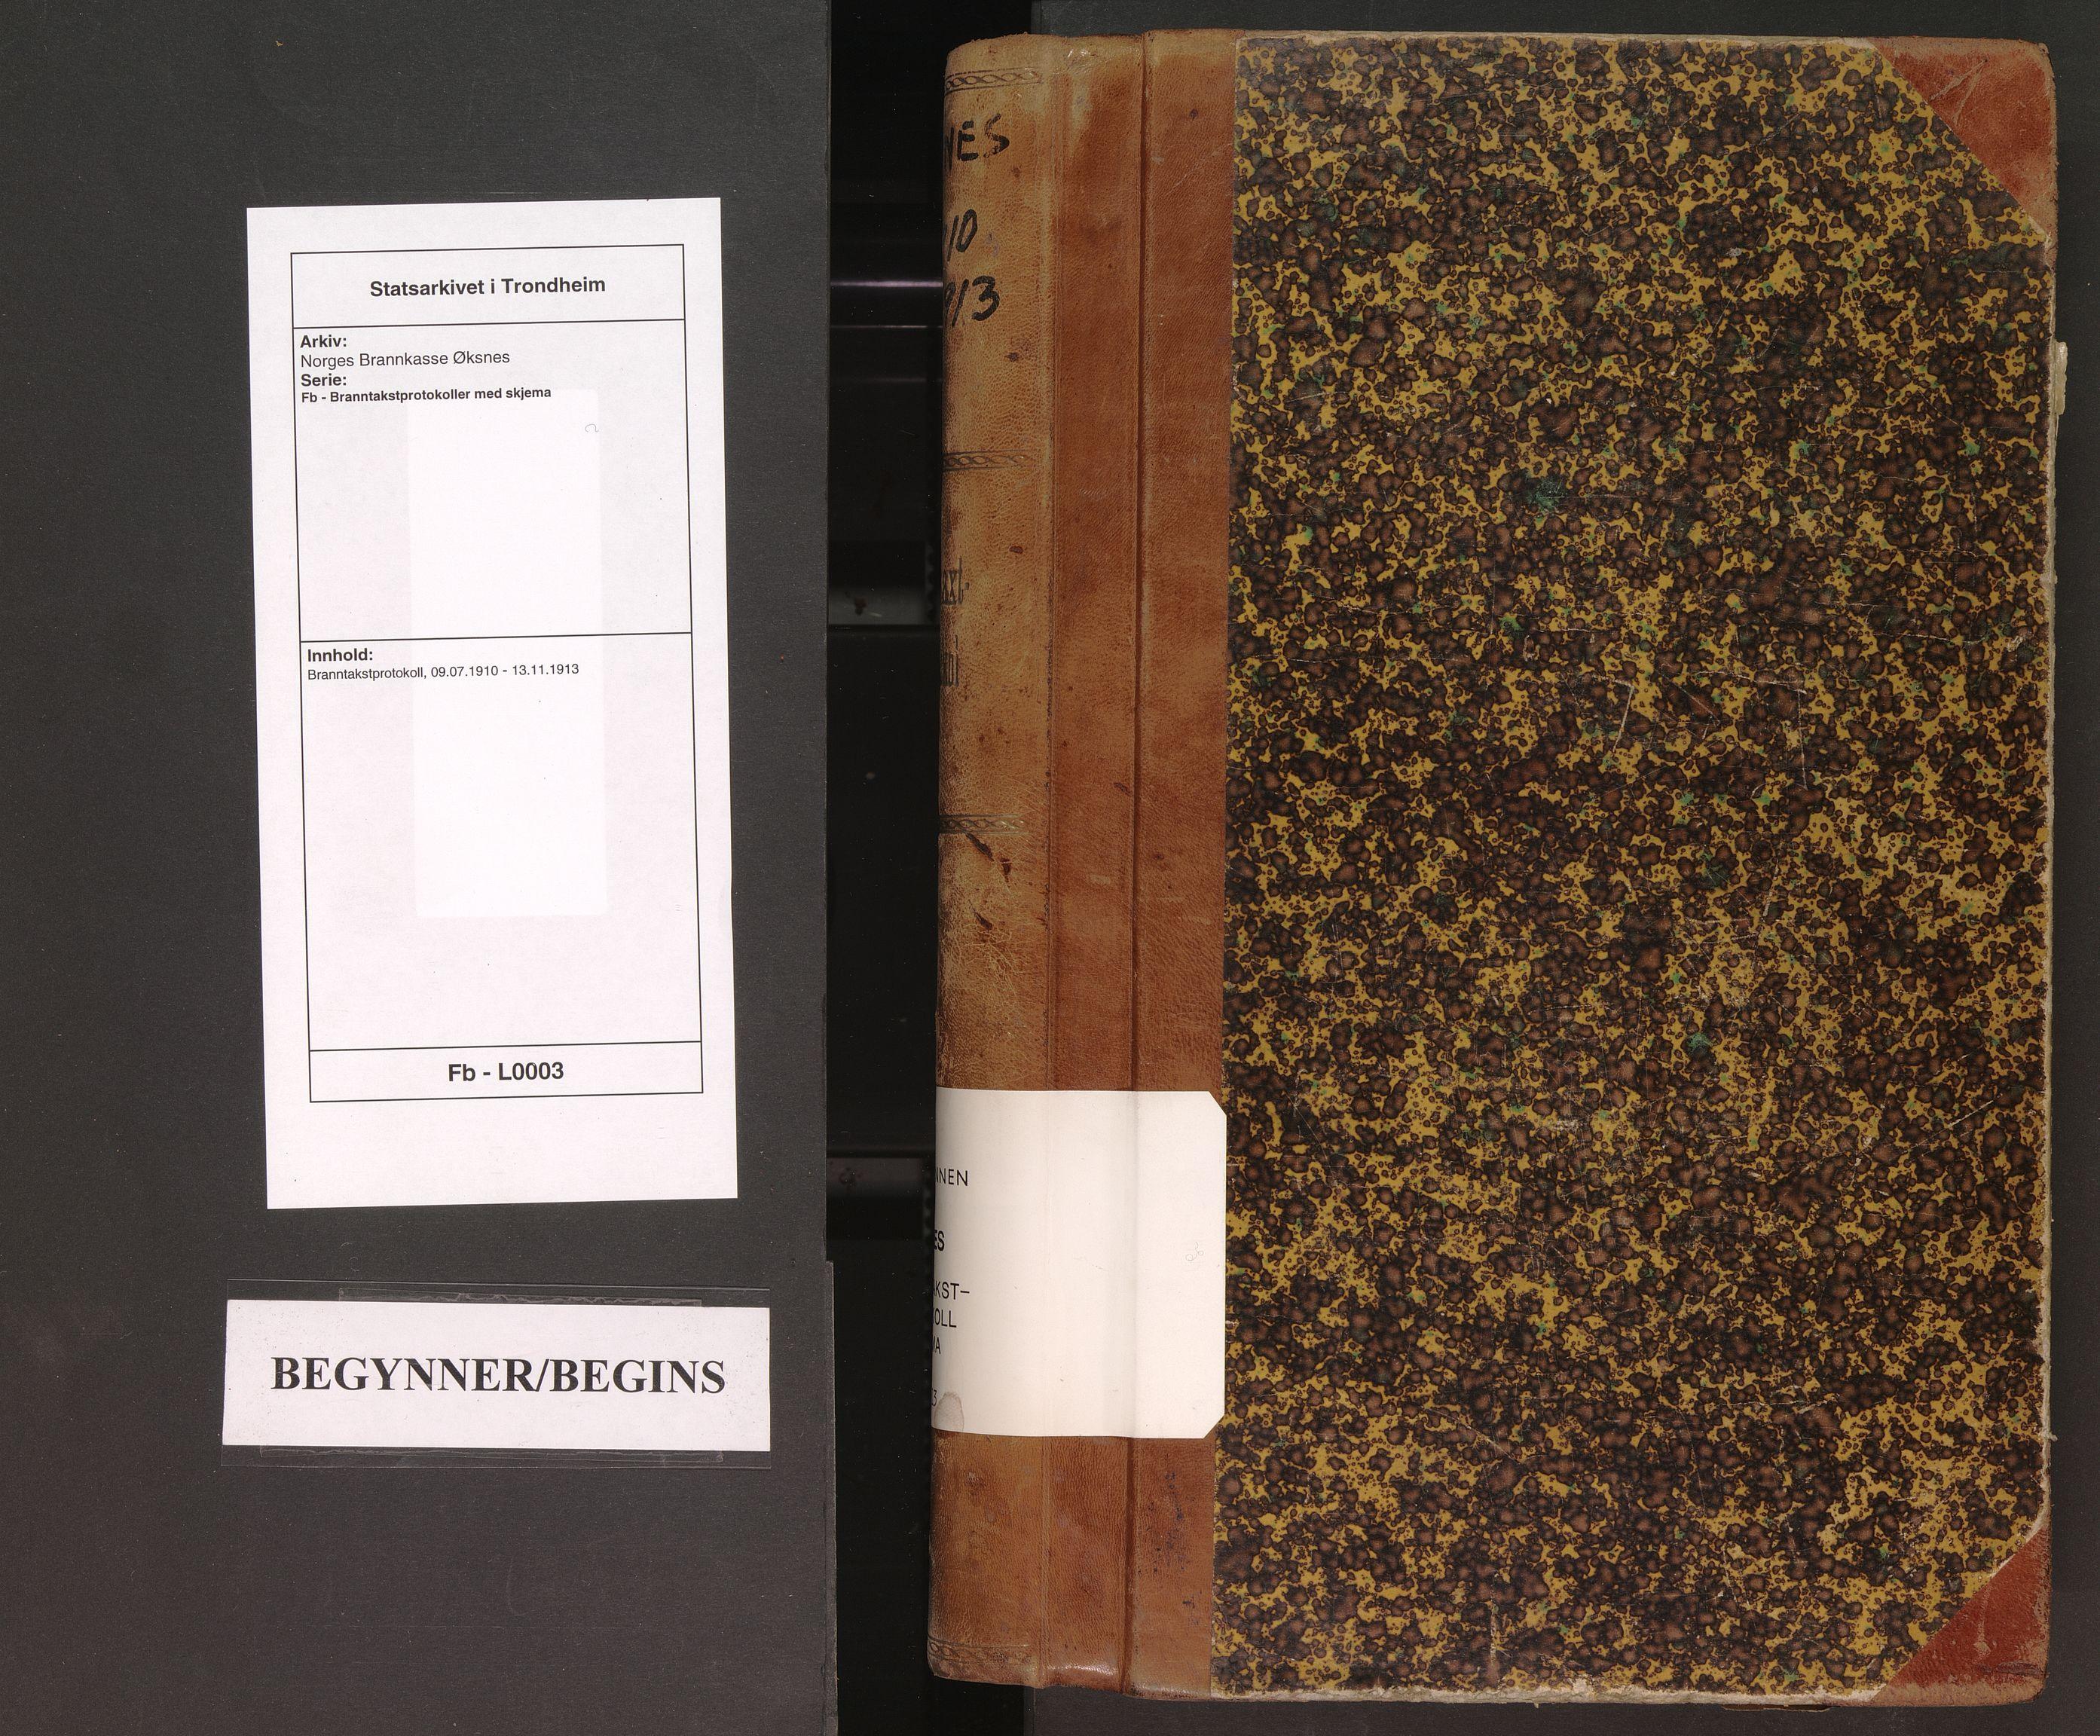 SAT, Norges Brannkasse Øksnes, Fb/L0003: Branntakstprotokoll, 1910-1913